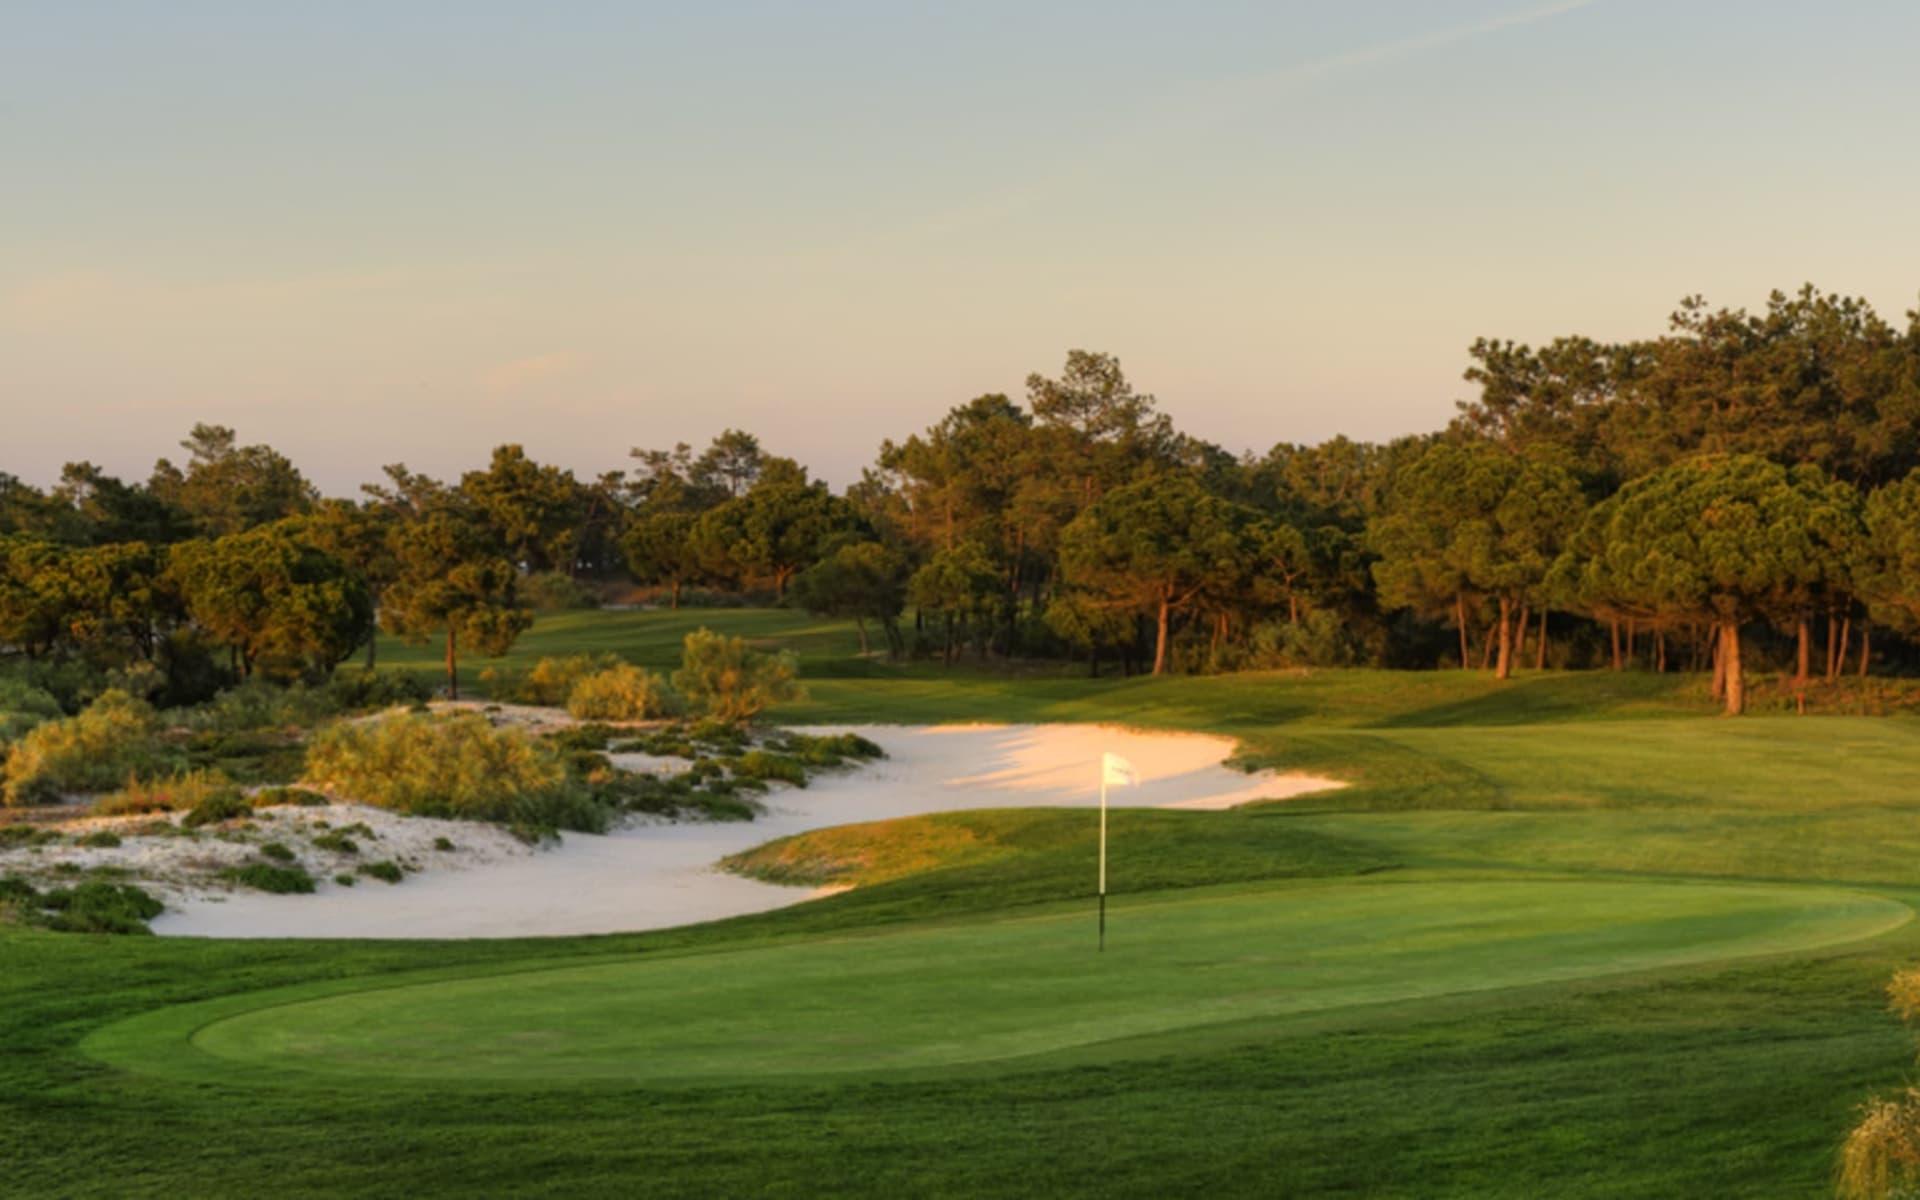 Troia Golf Resort in Lissabon: Troia Golf 14.Hole